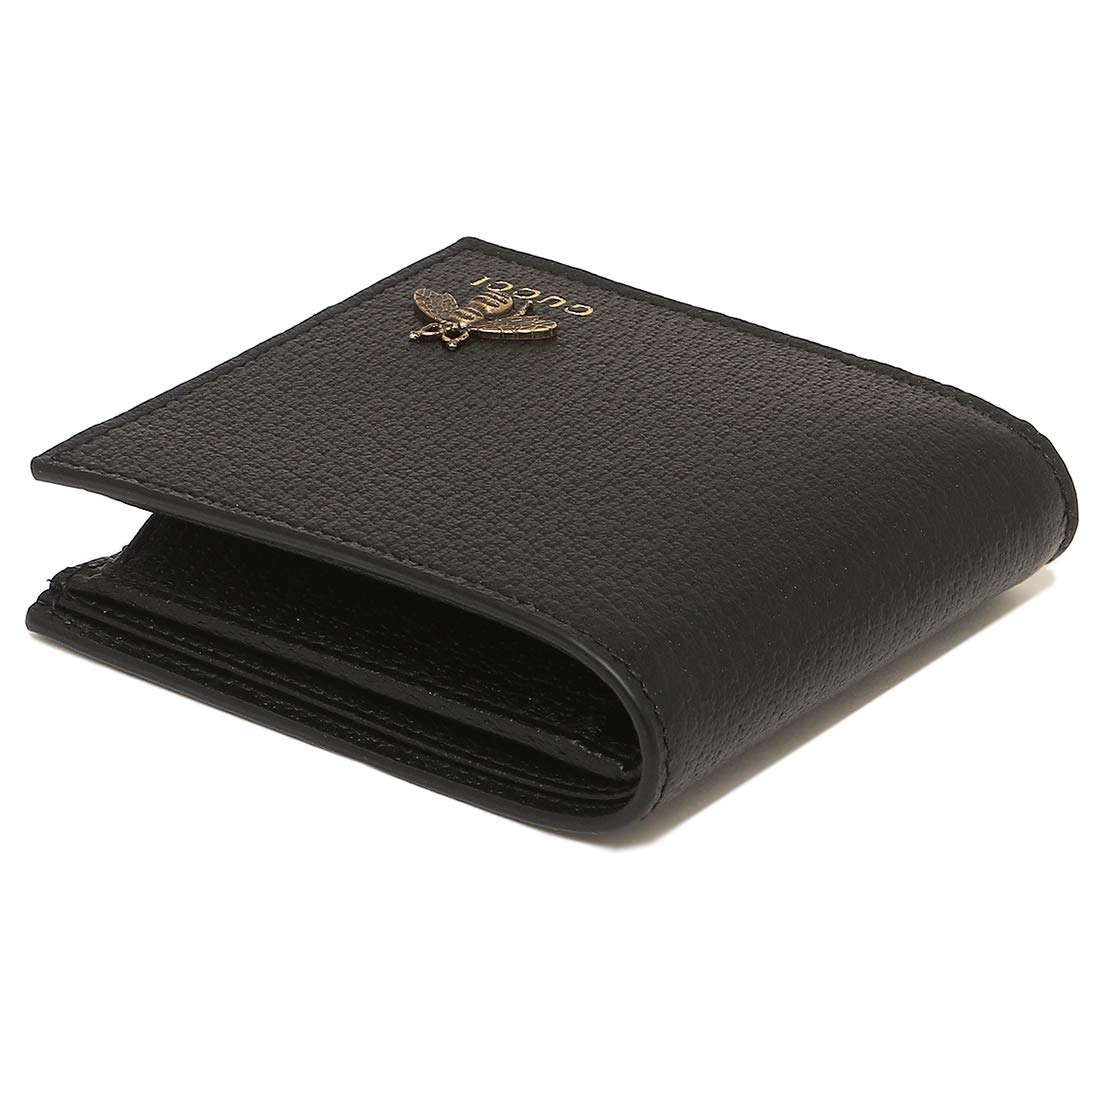 18d257c19df1 Amazon | [グッチ]折財布 メンズ GUCCI 522915 DJ20T 1000 ブラック [並行輸入品] | GUCCI(グッチ) | 財布